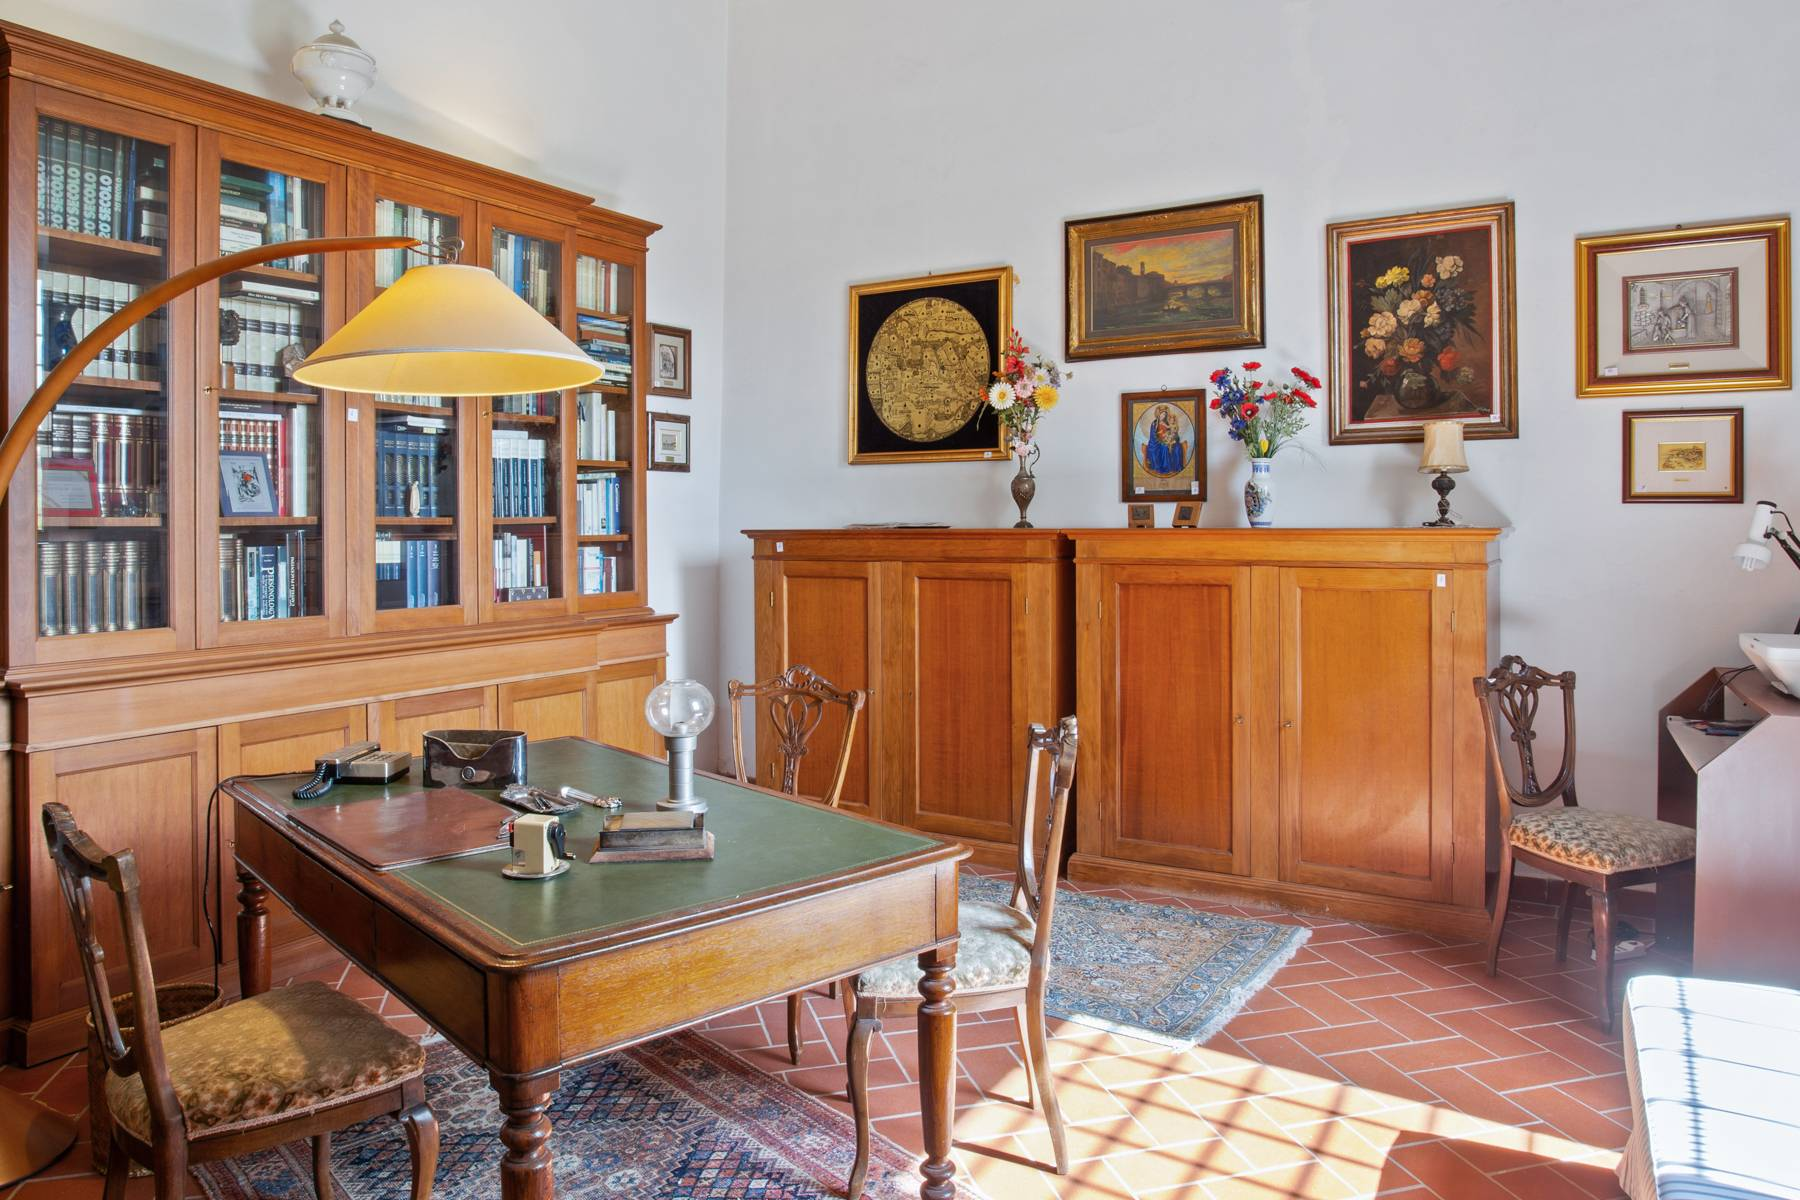 Appartamento in Vendita a Scandicci: 5 locali, 170 mq - Foto 6